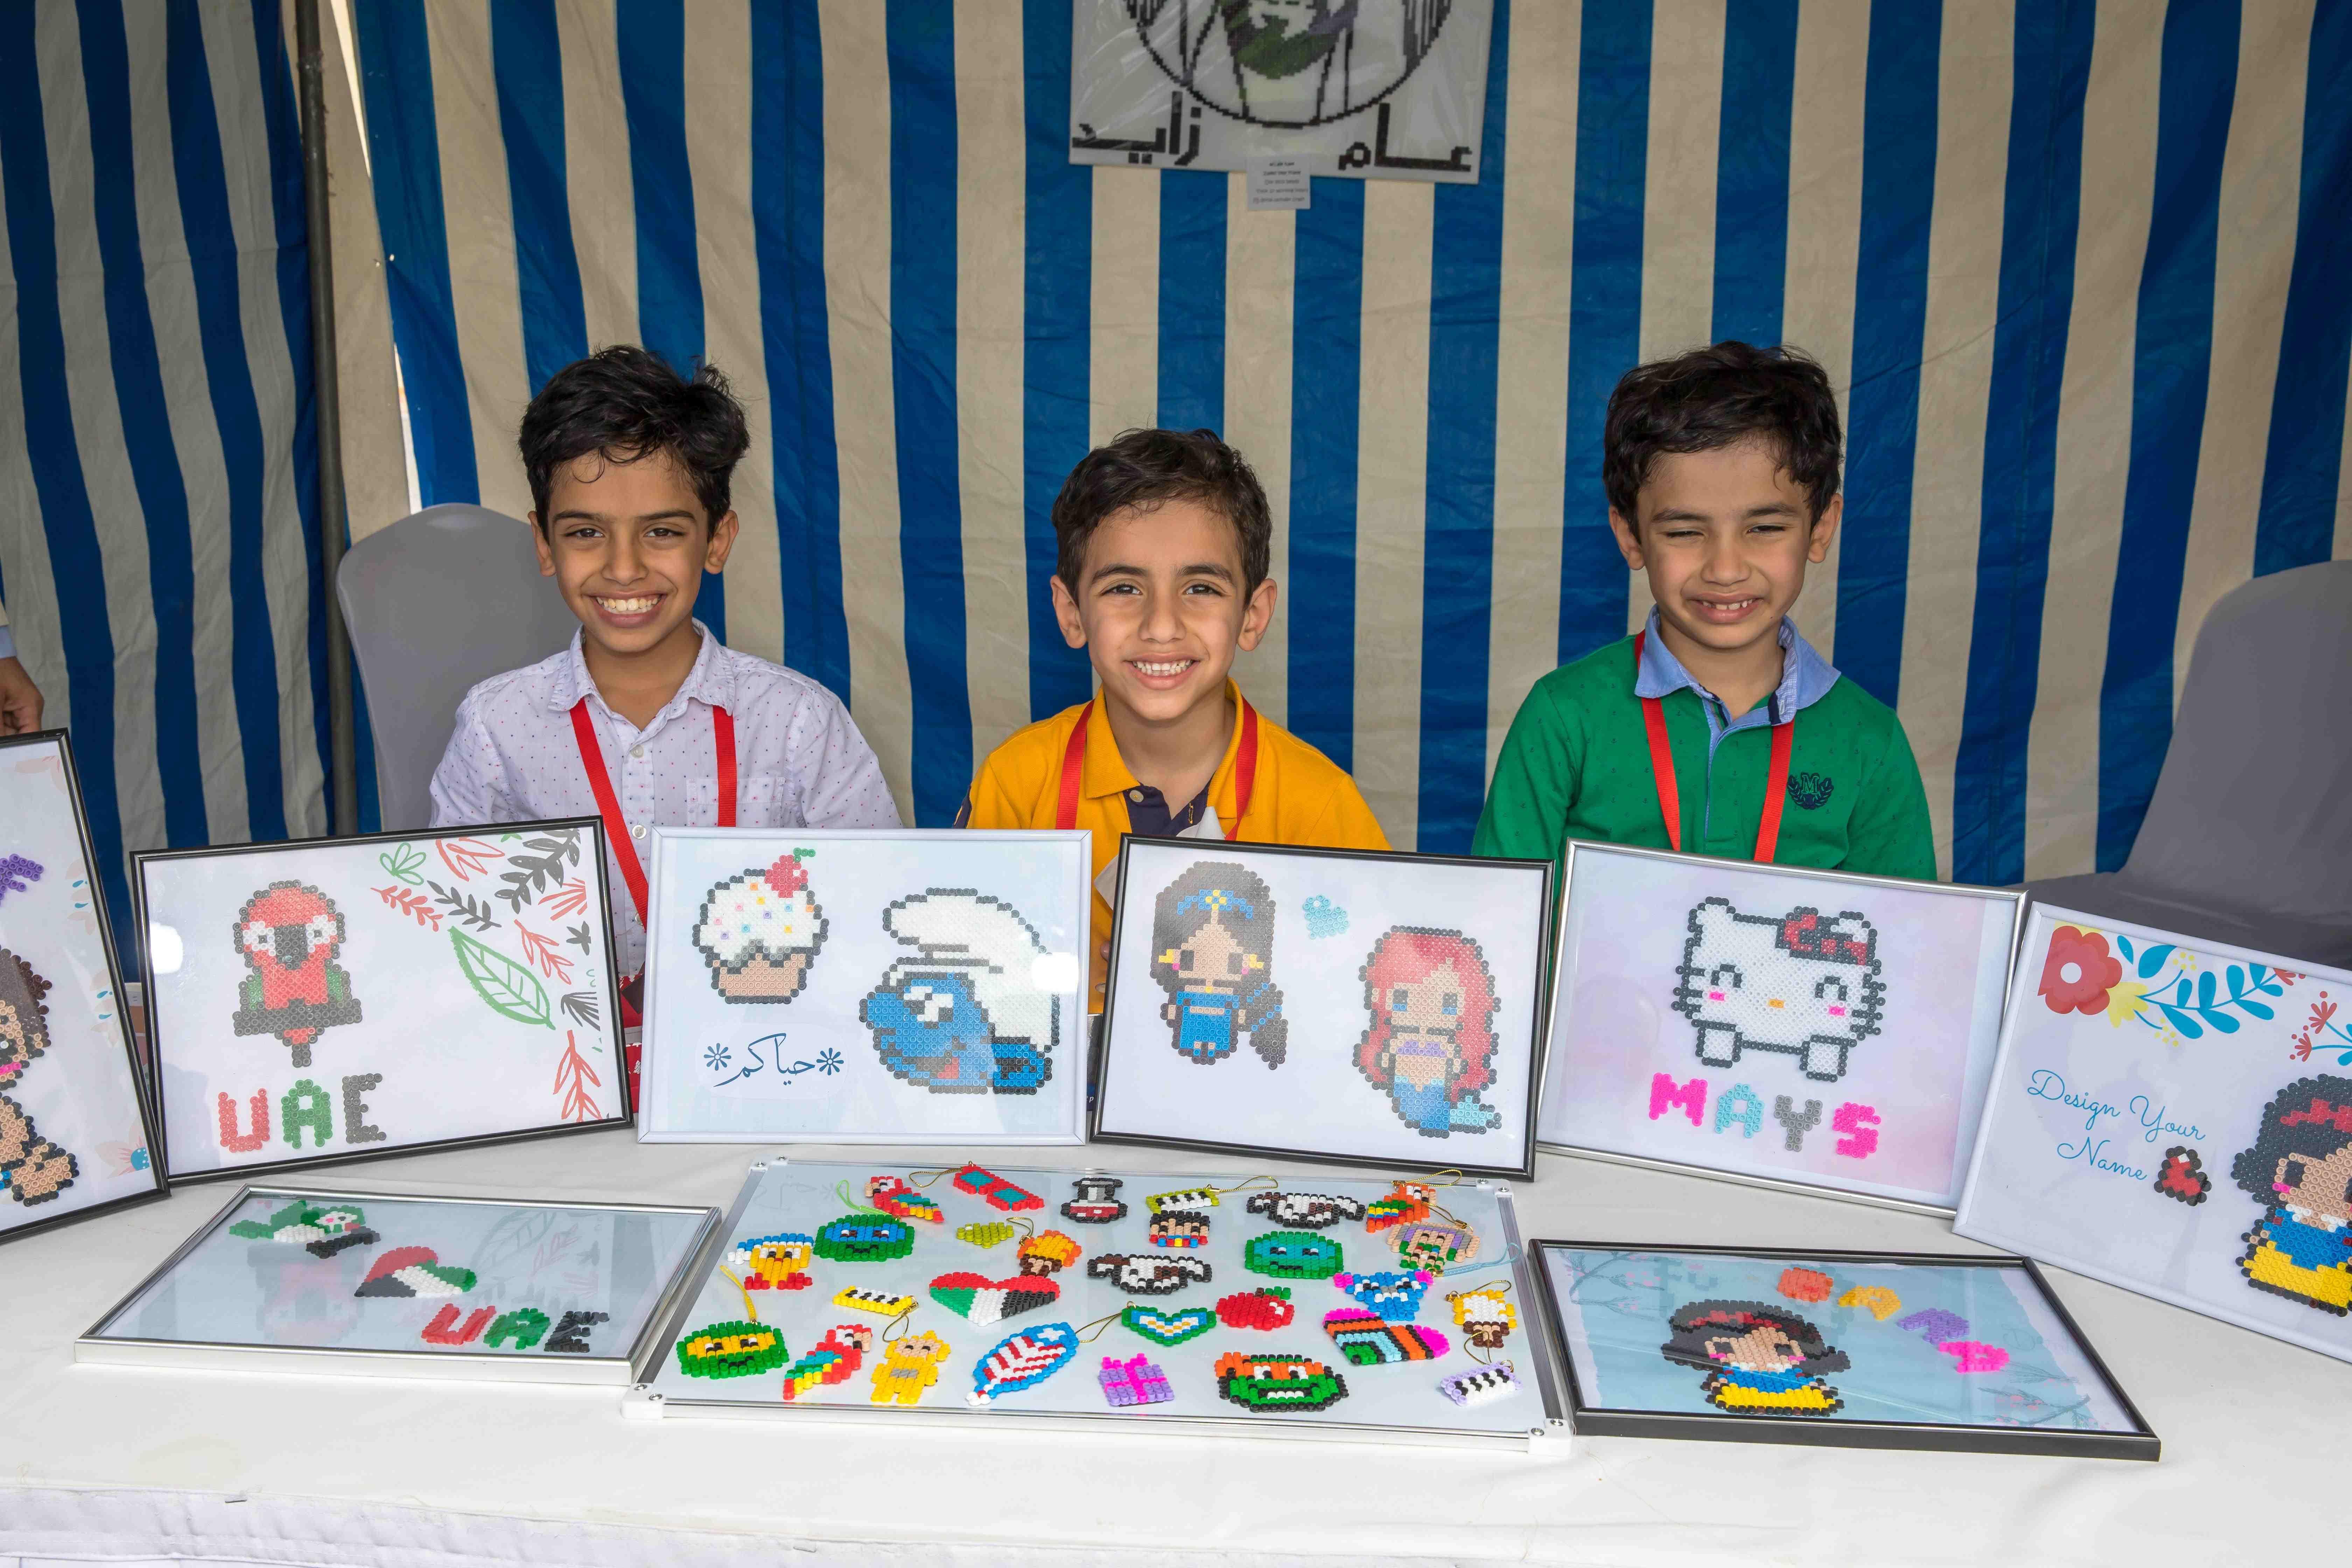 Dubai Hosts its First Mini Maker Faire in the United Arab Emirates